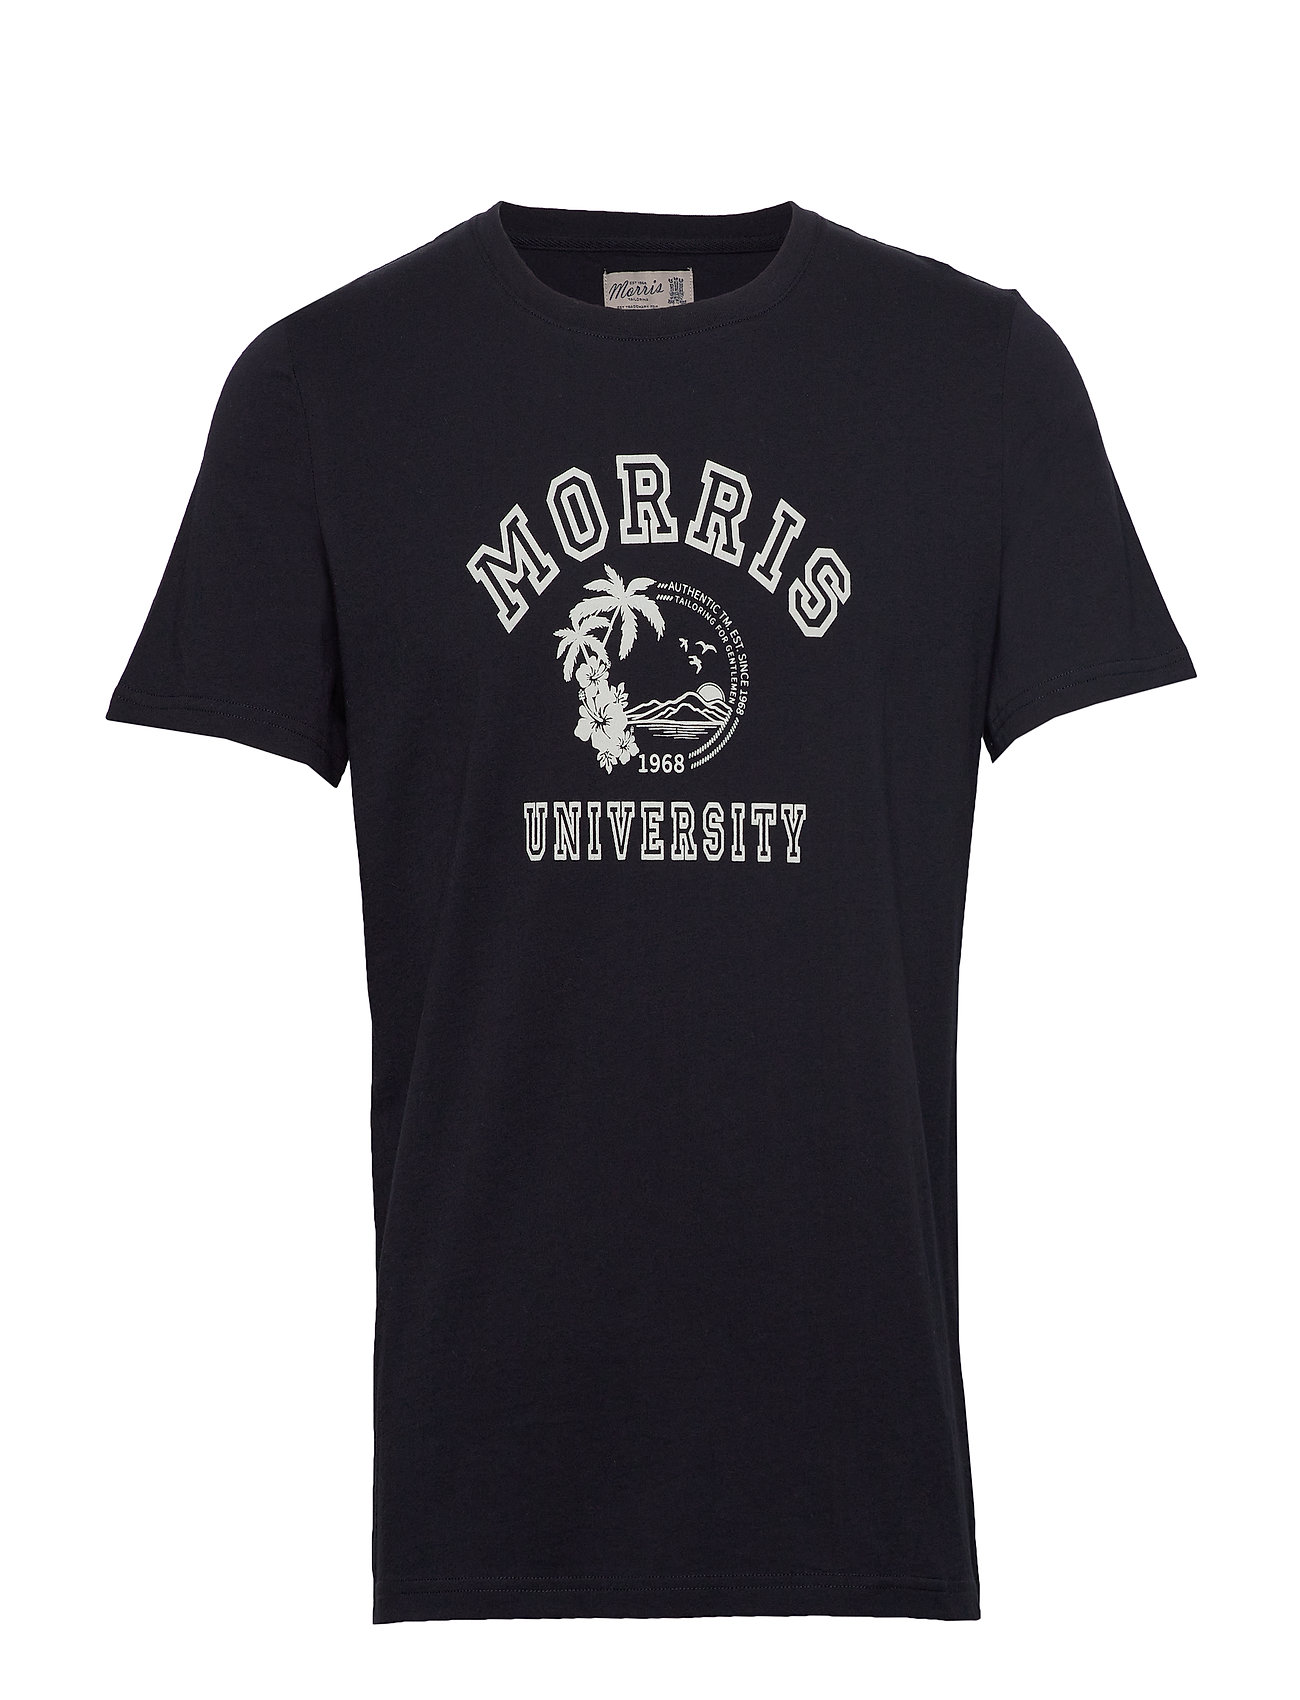 Image of Tahaa Tee T-shirt Blå Morris (3484678067)